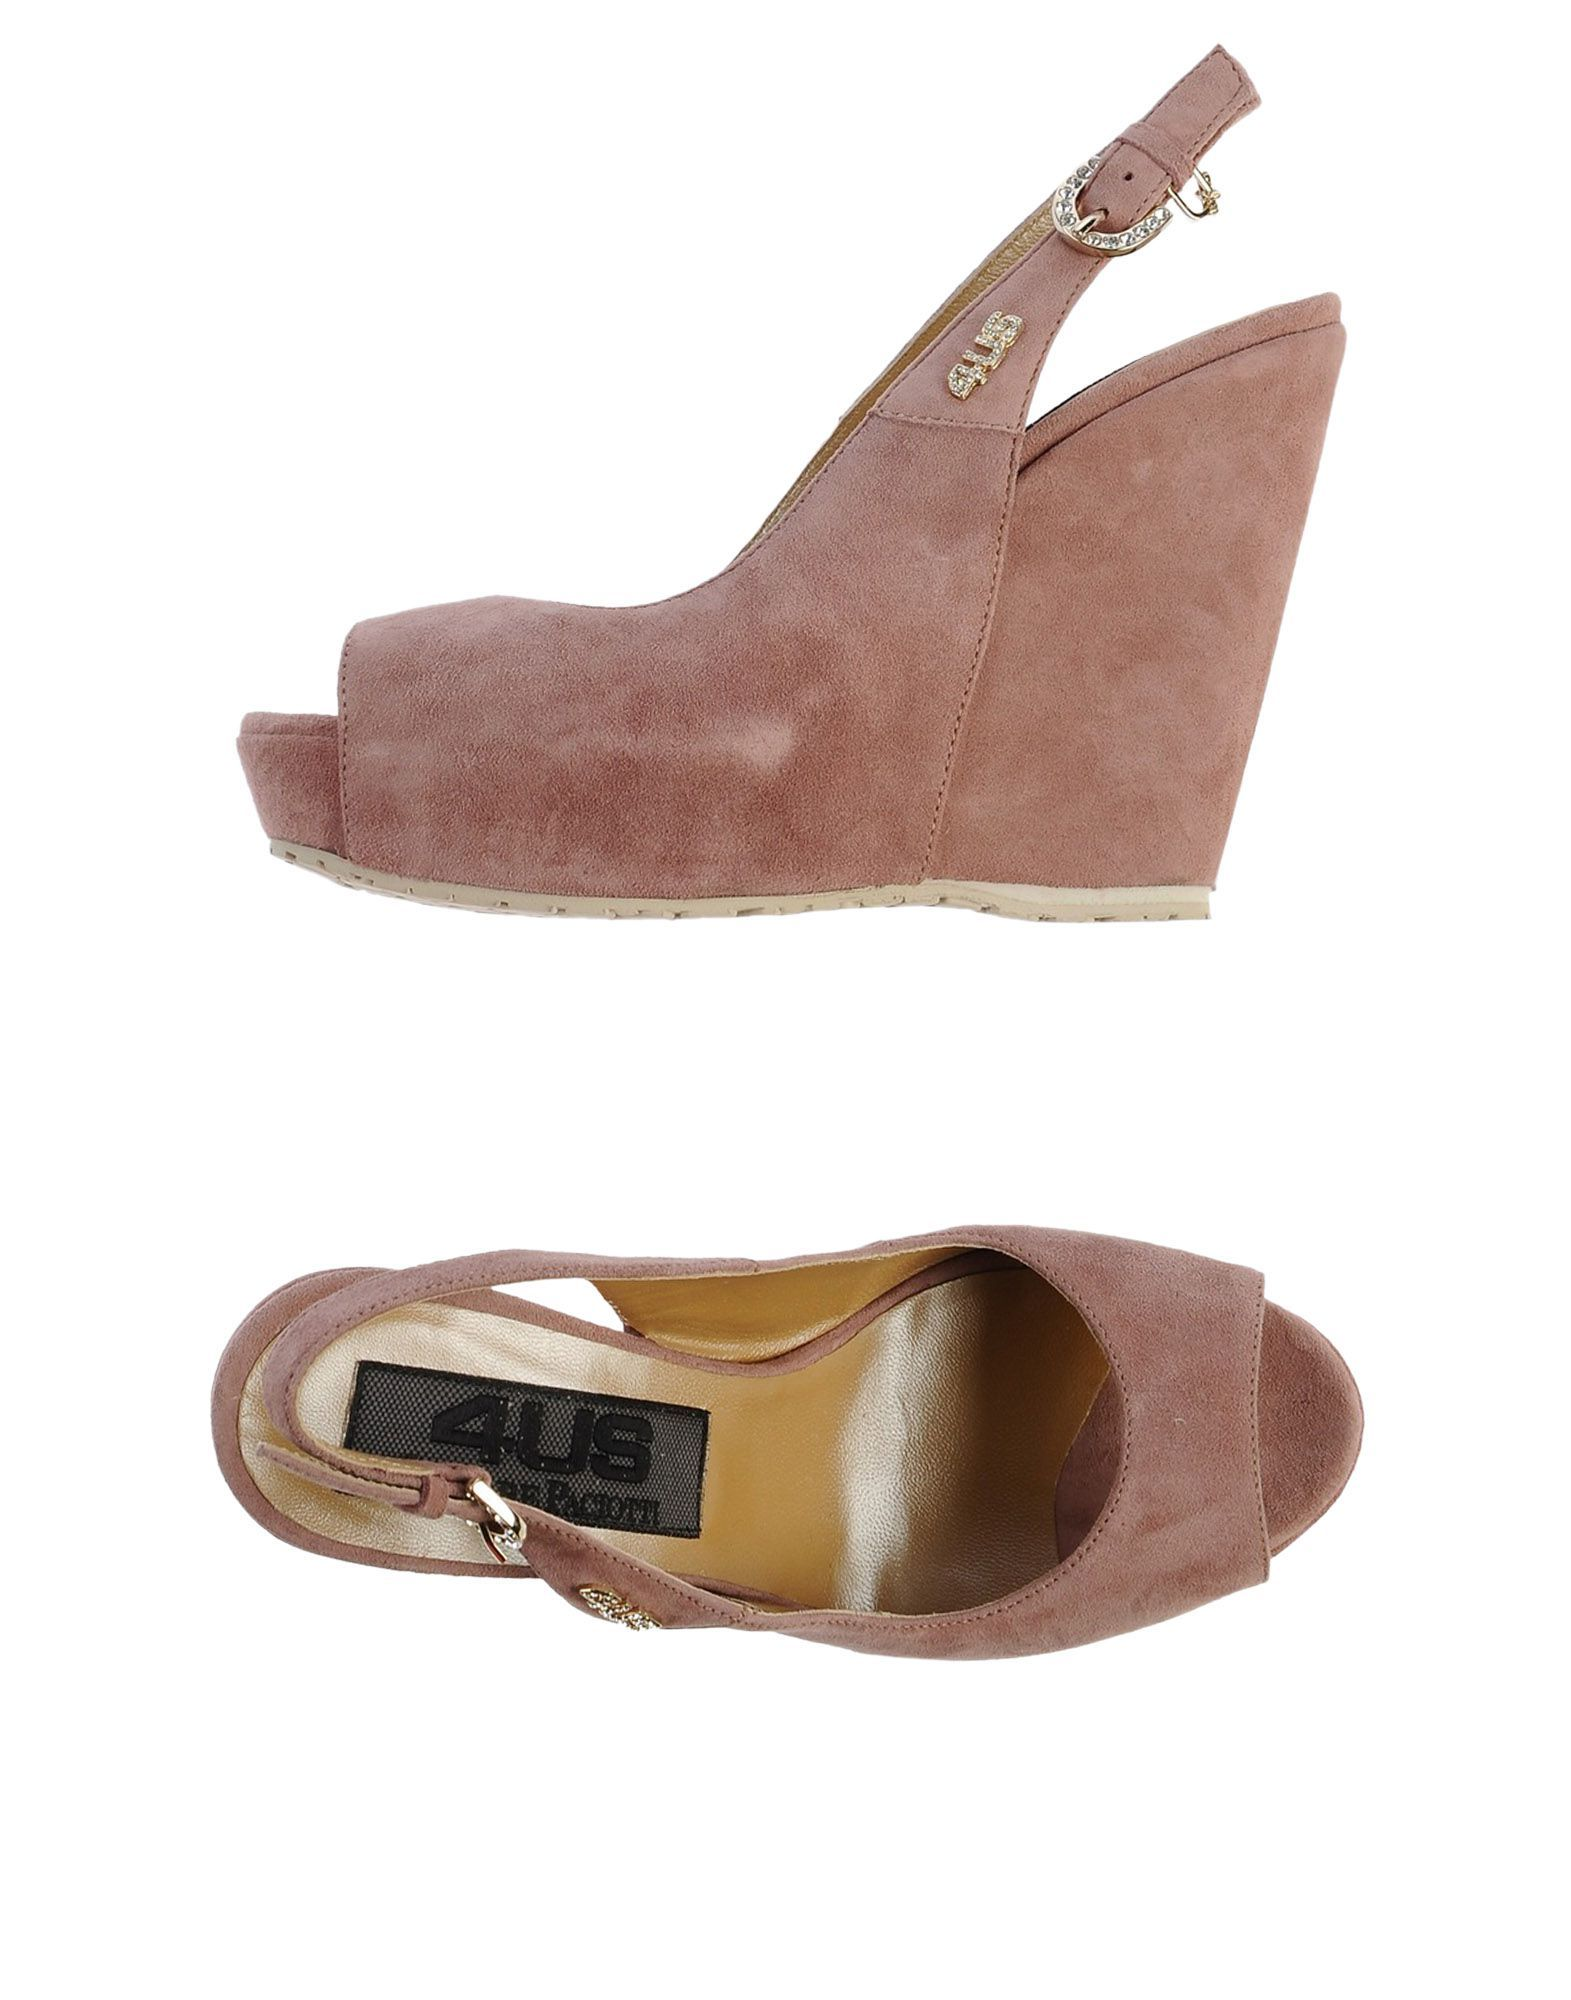 9d0f35bc8f5 Cesare Paciotti 4Us Sandals - Women Cesare Paciotti 4Us Sandals online on YOOX  United States